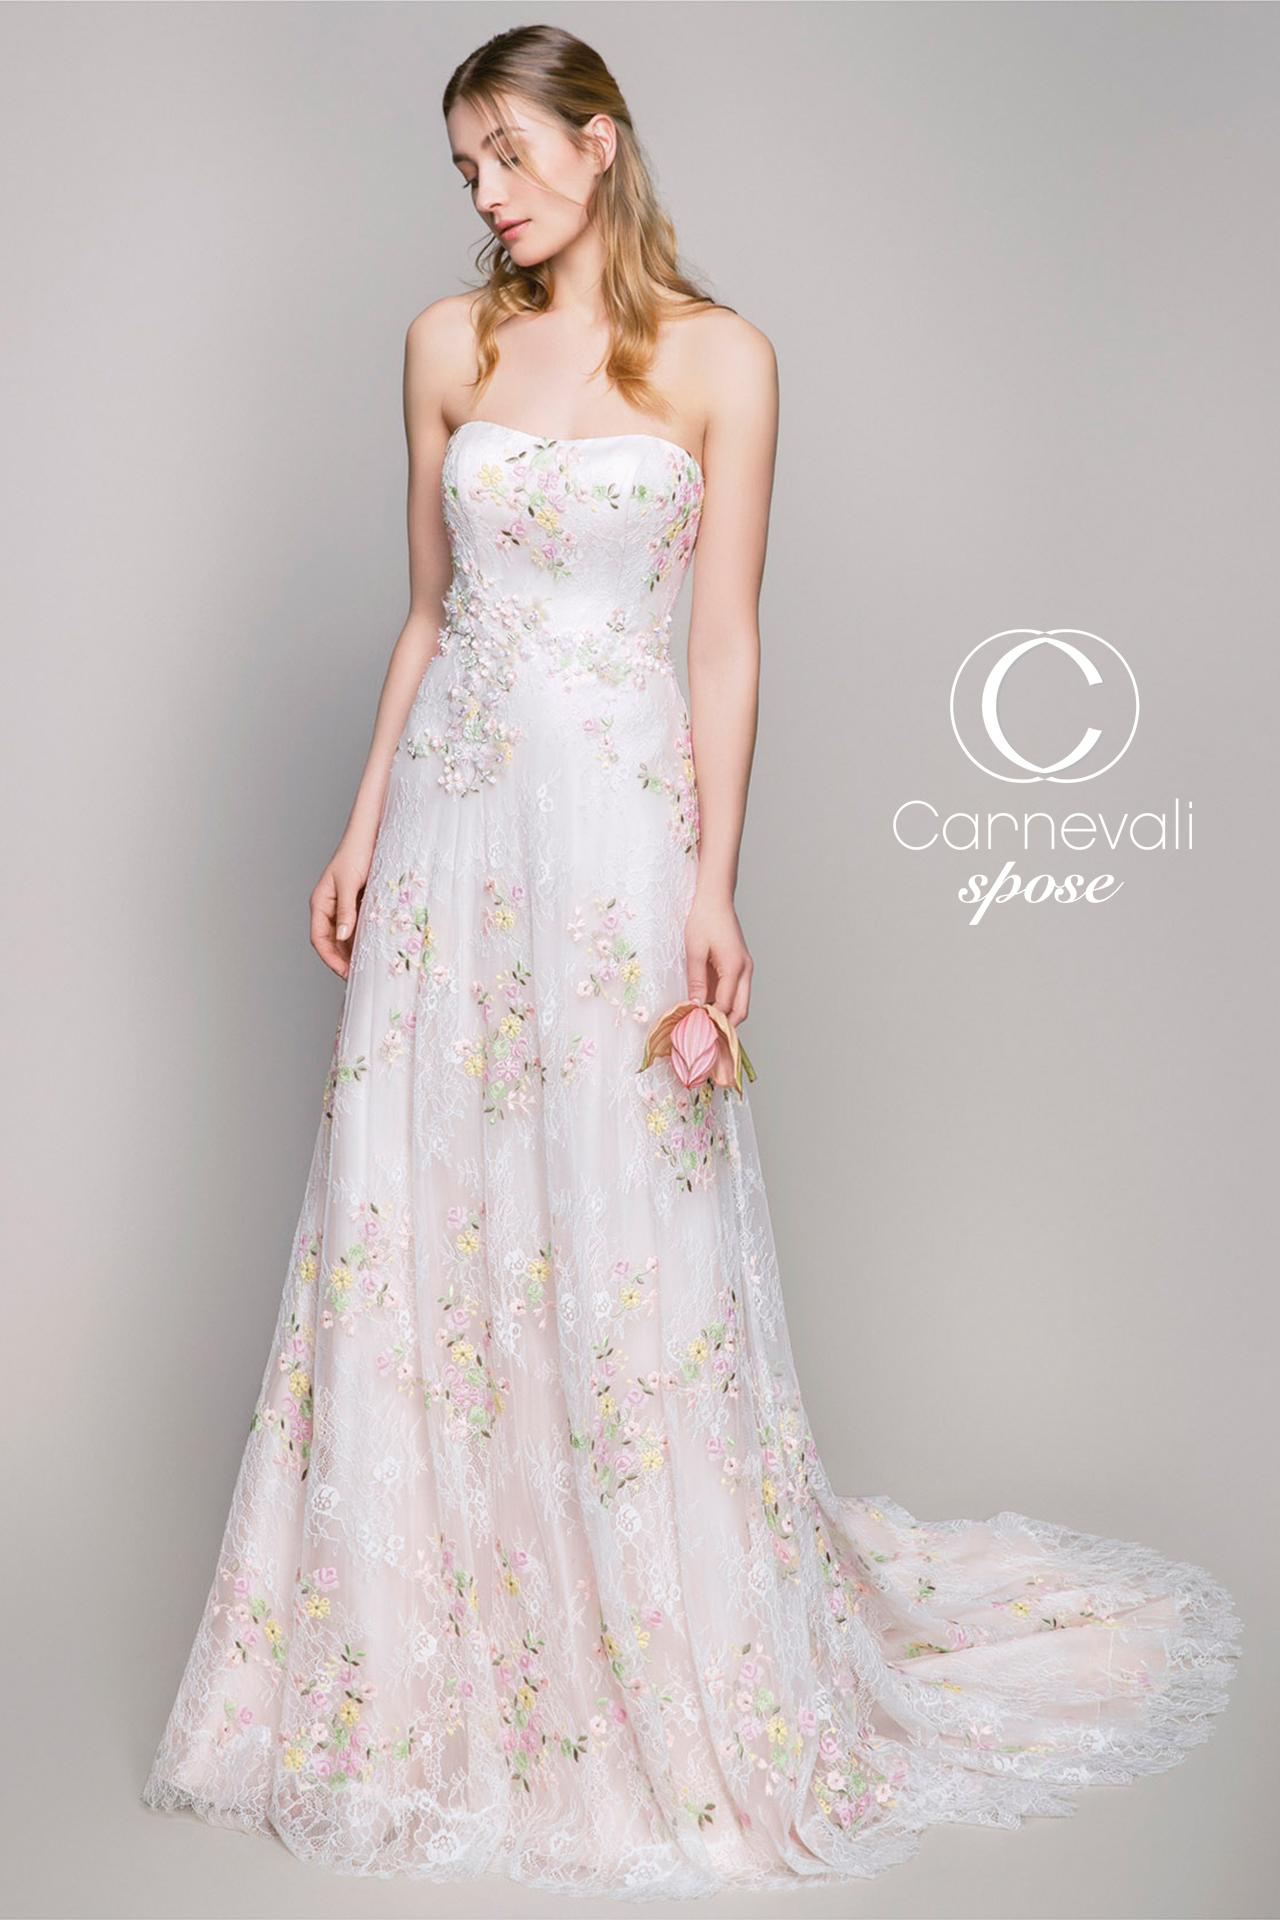 1b885a7f1600 BLUMARINE 6746 - Carnevali Spose